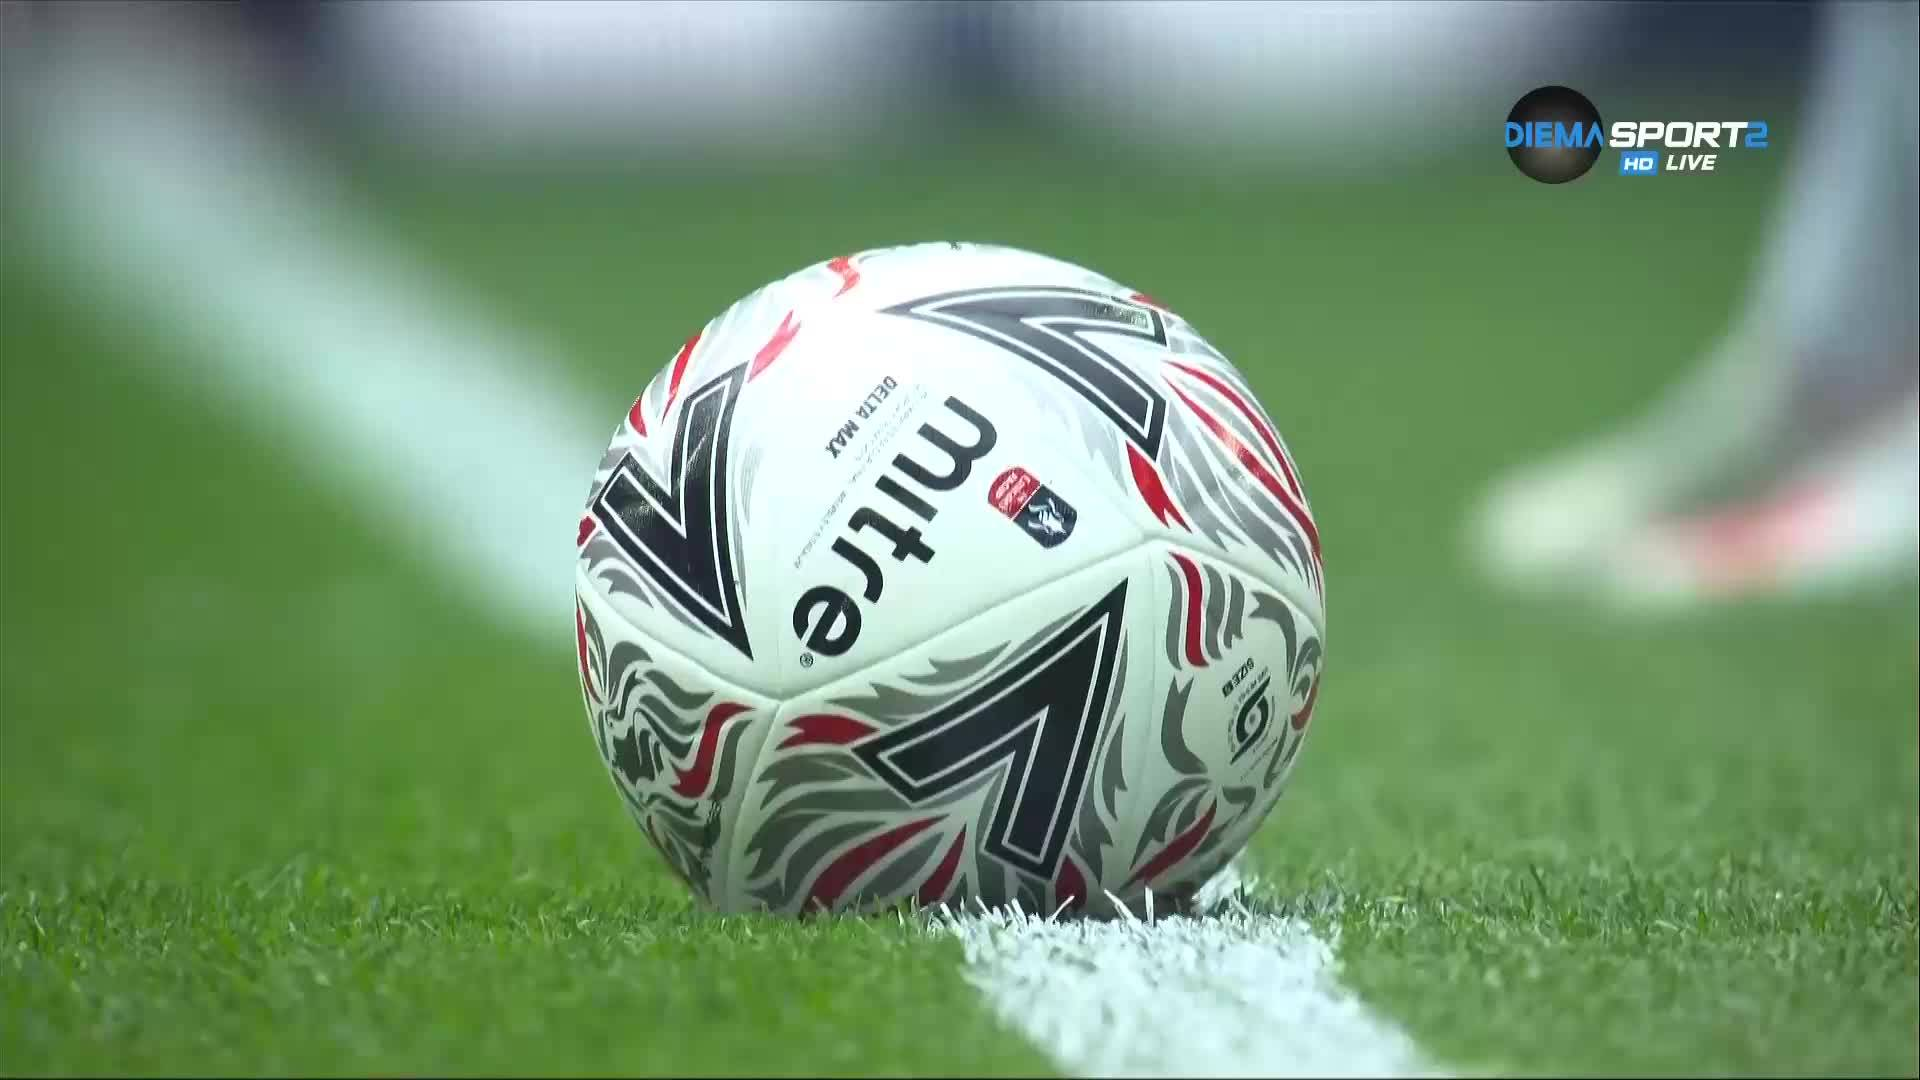 Манчестър Сити - Уотфорд 6:0 /репортаж/